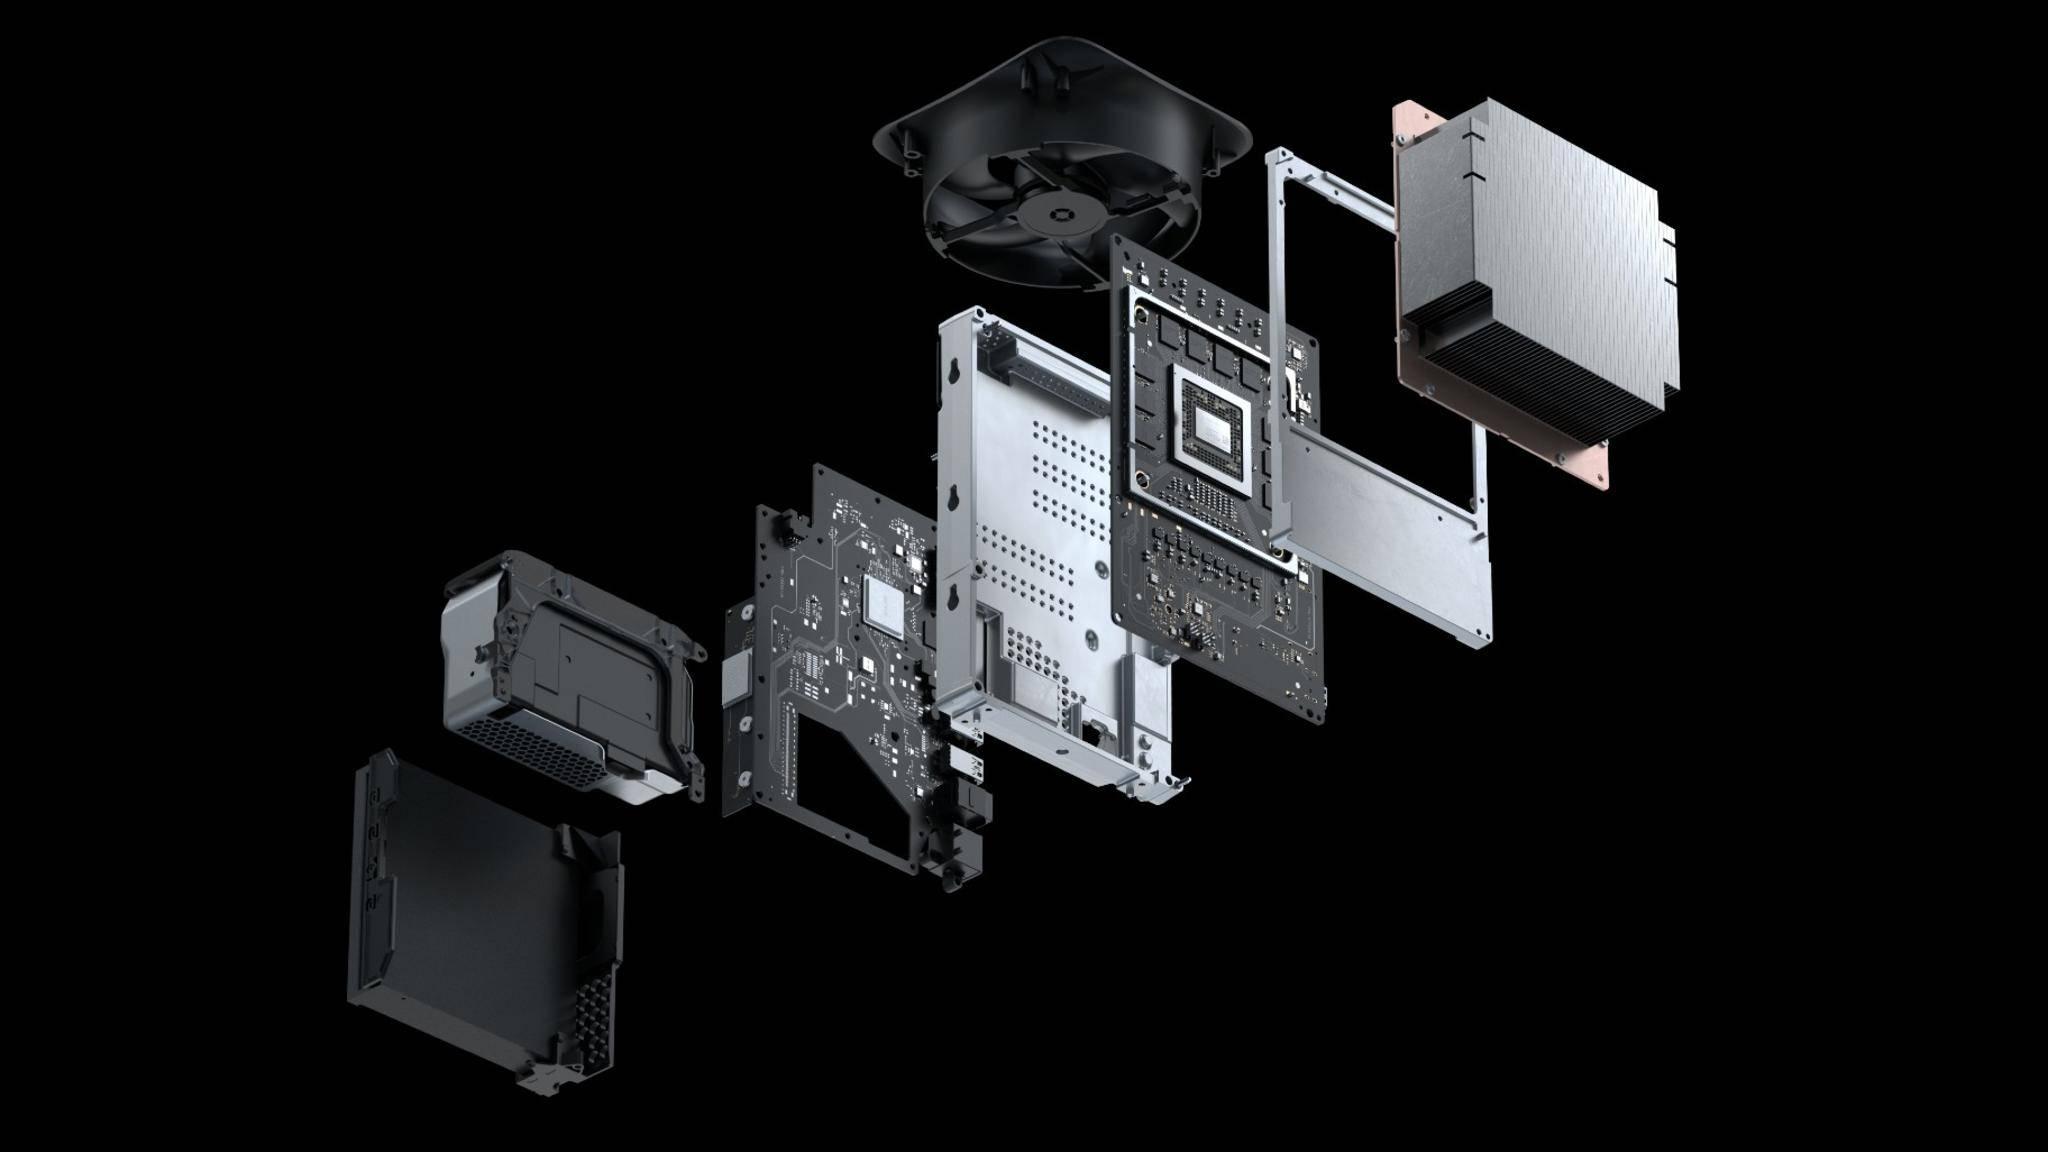 xbox-series-x-architektur-explode-microsoft